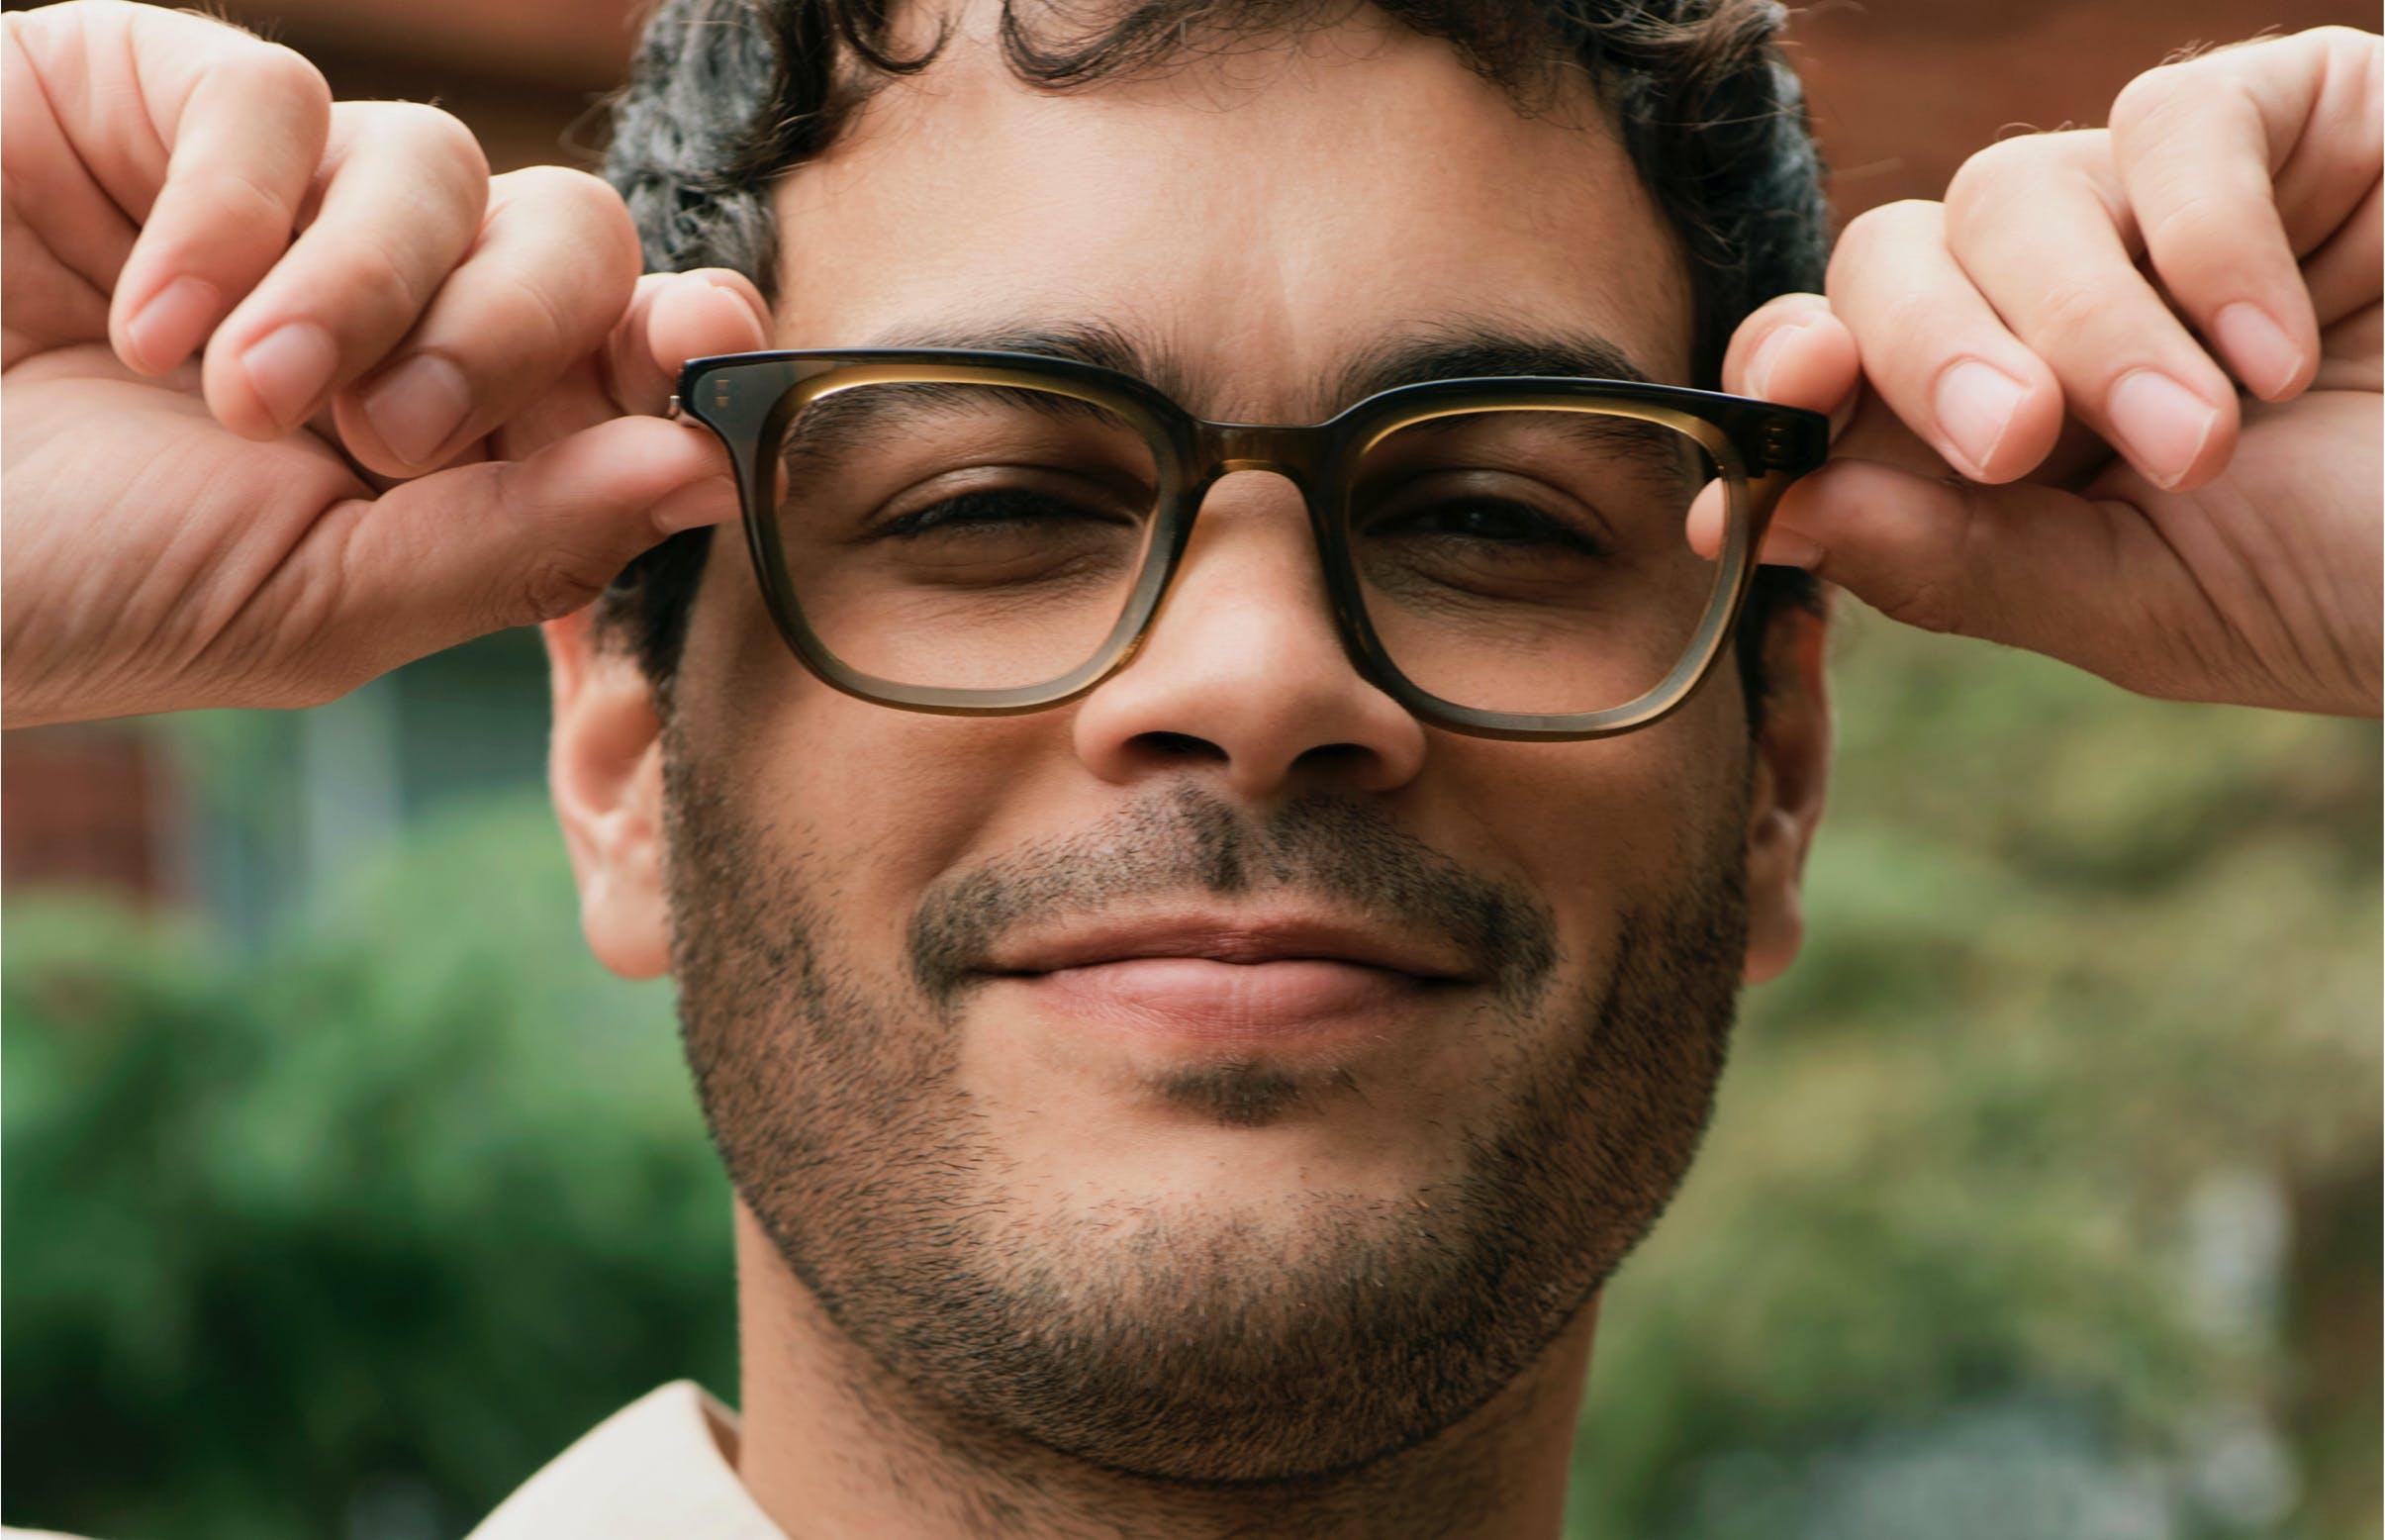 Man adjusting Nolan glasses and smiling